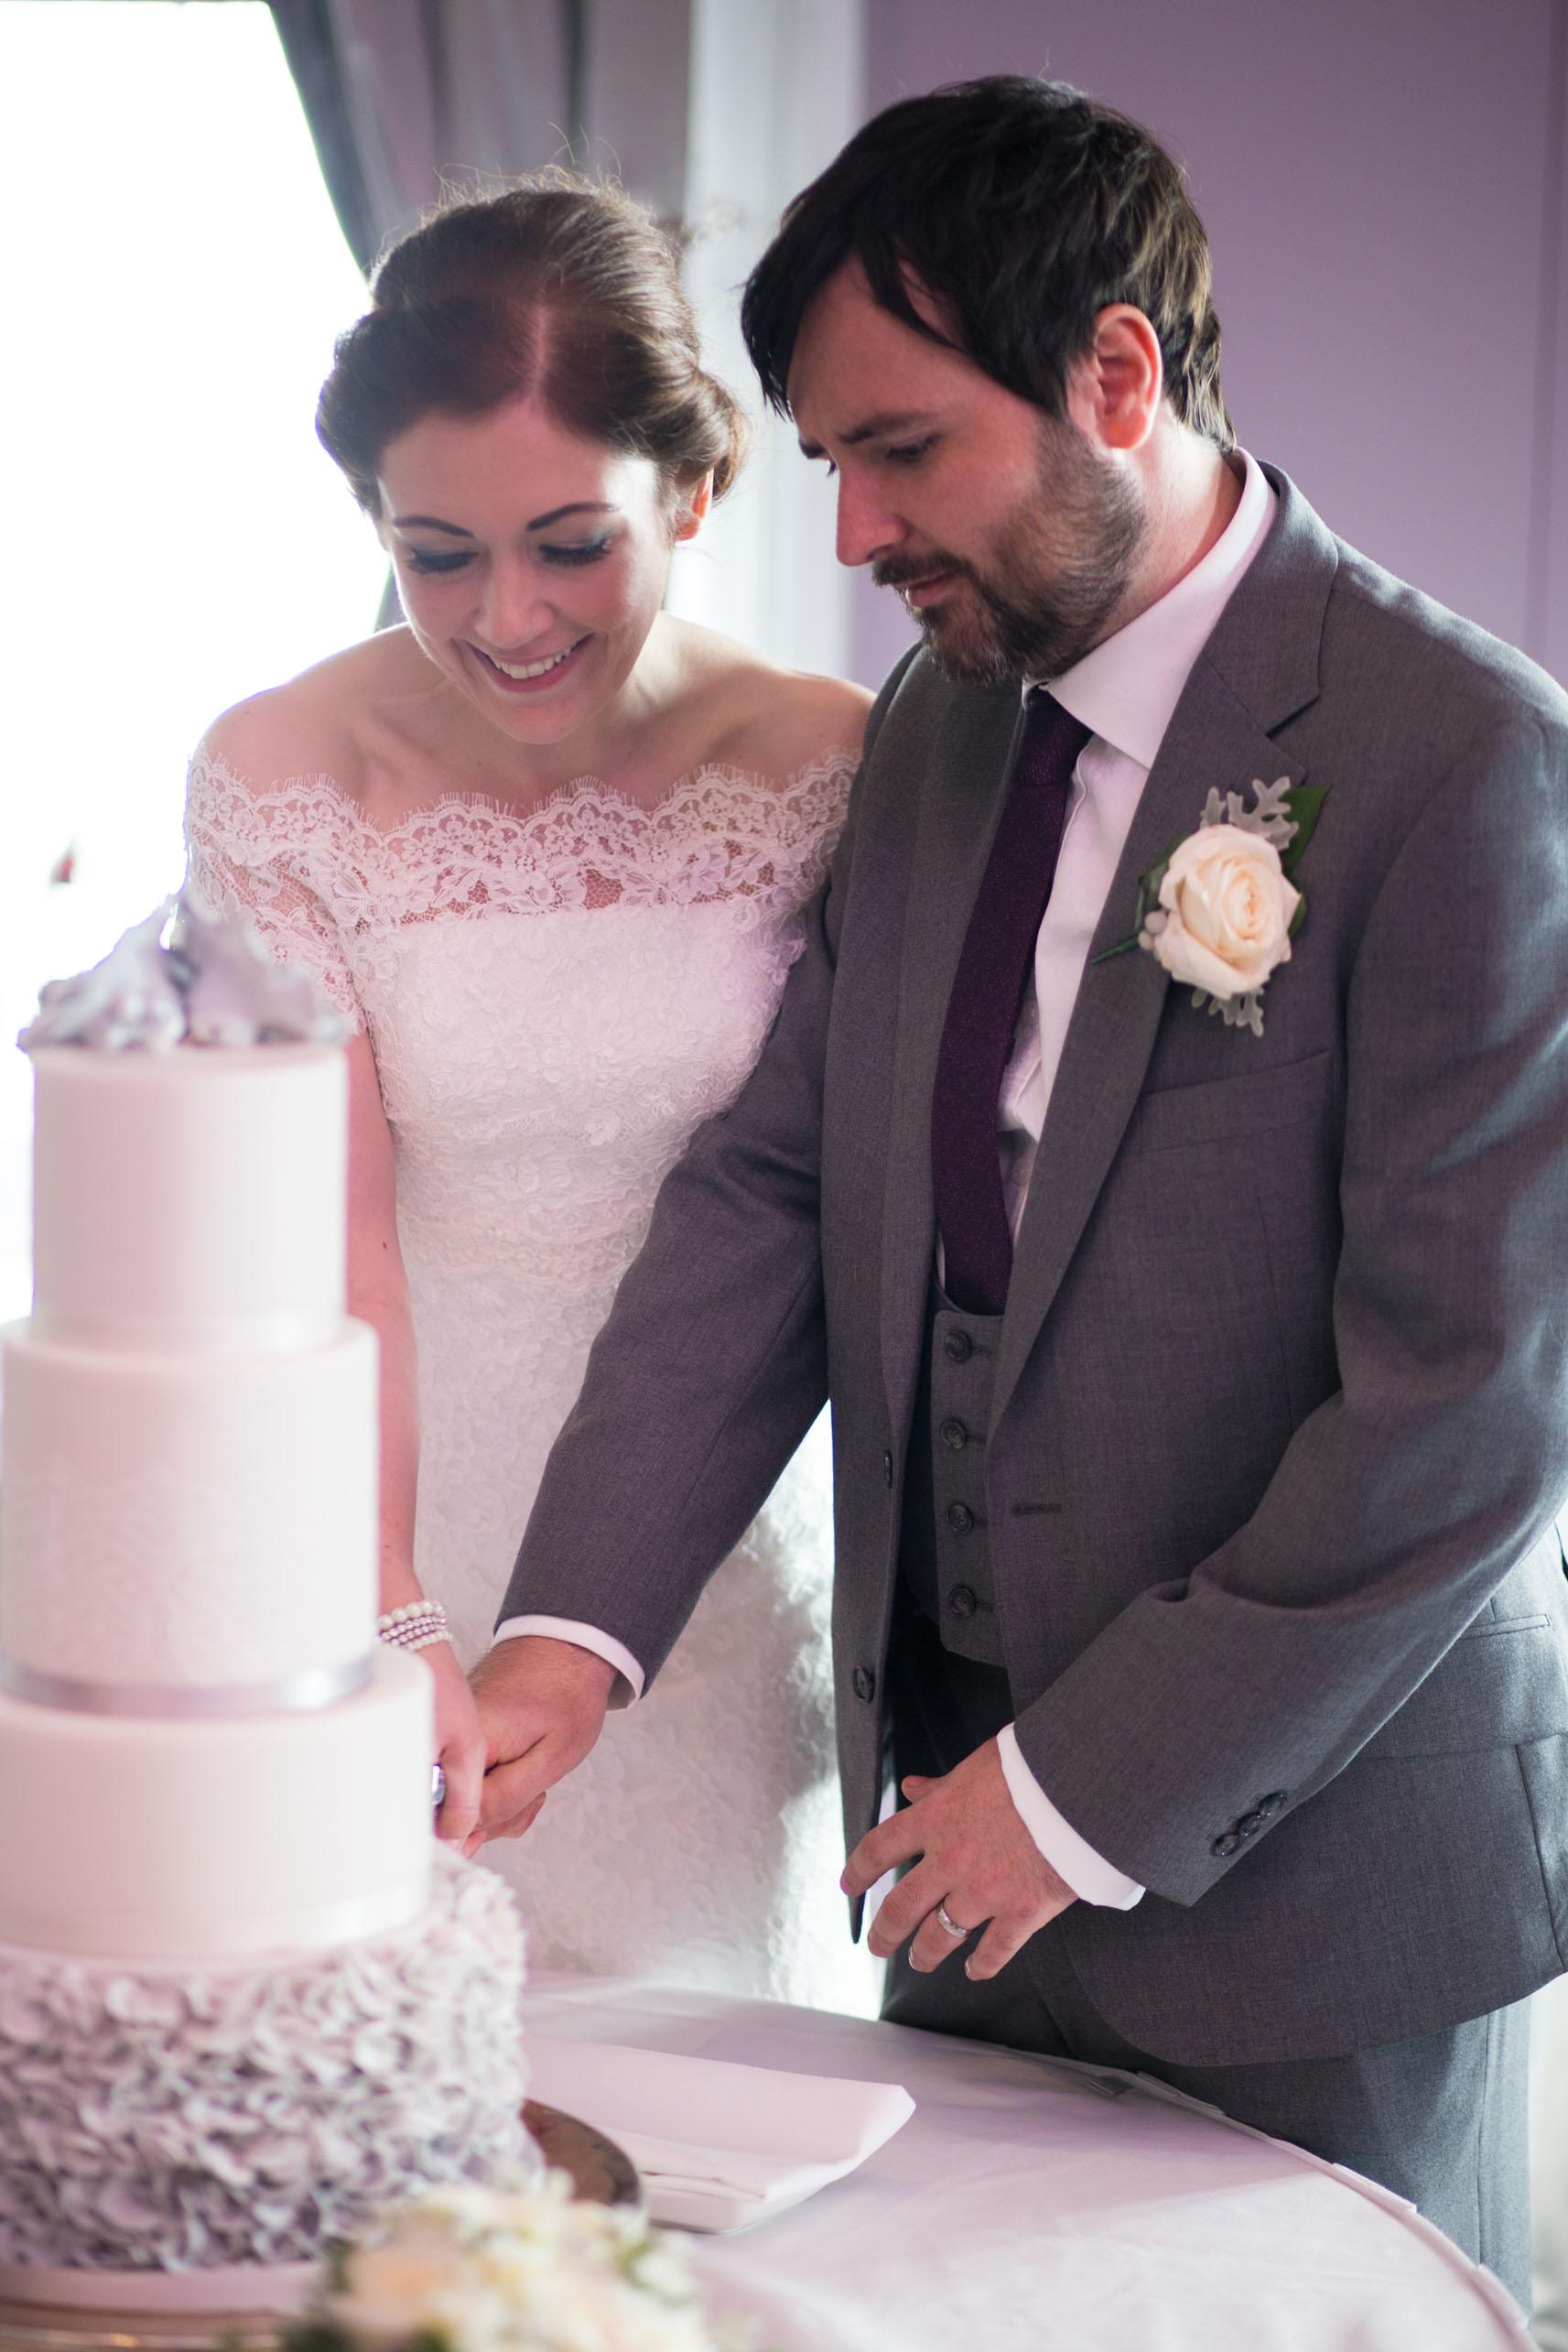 Image: Simpatico Wedding Photography